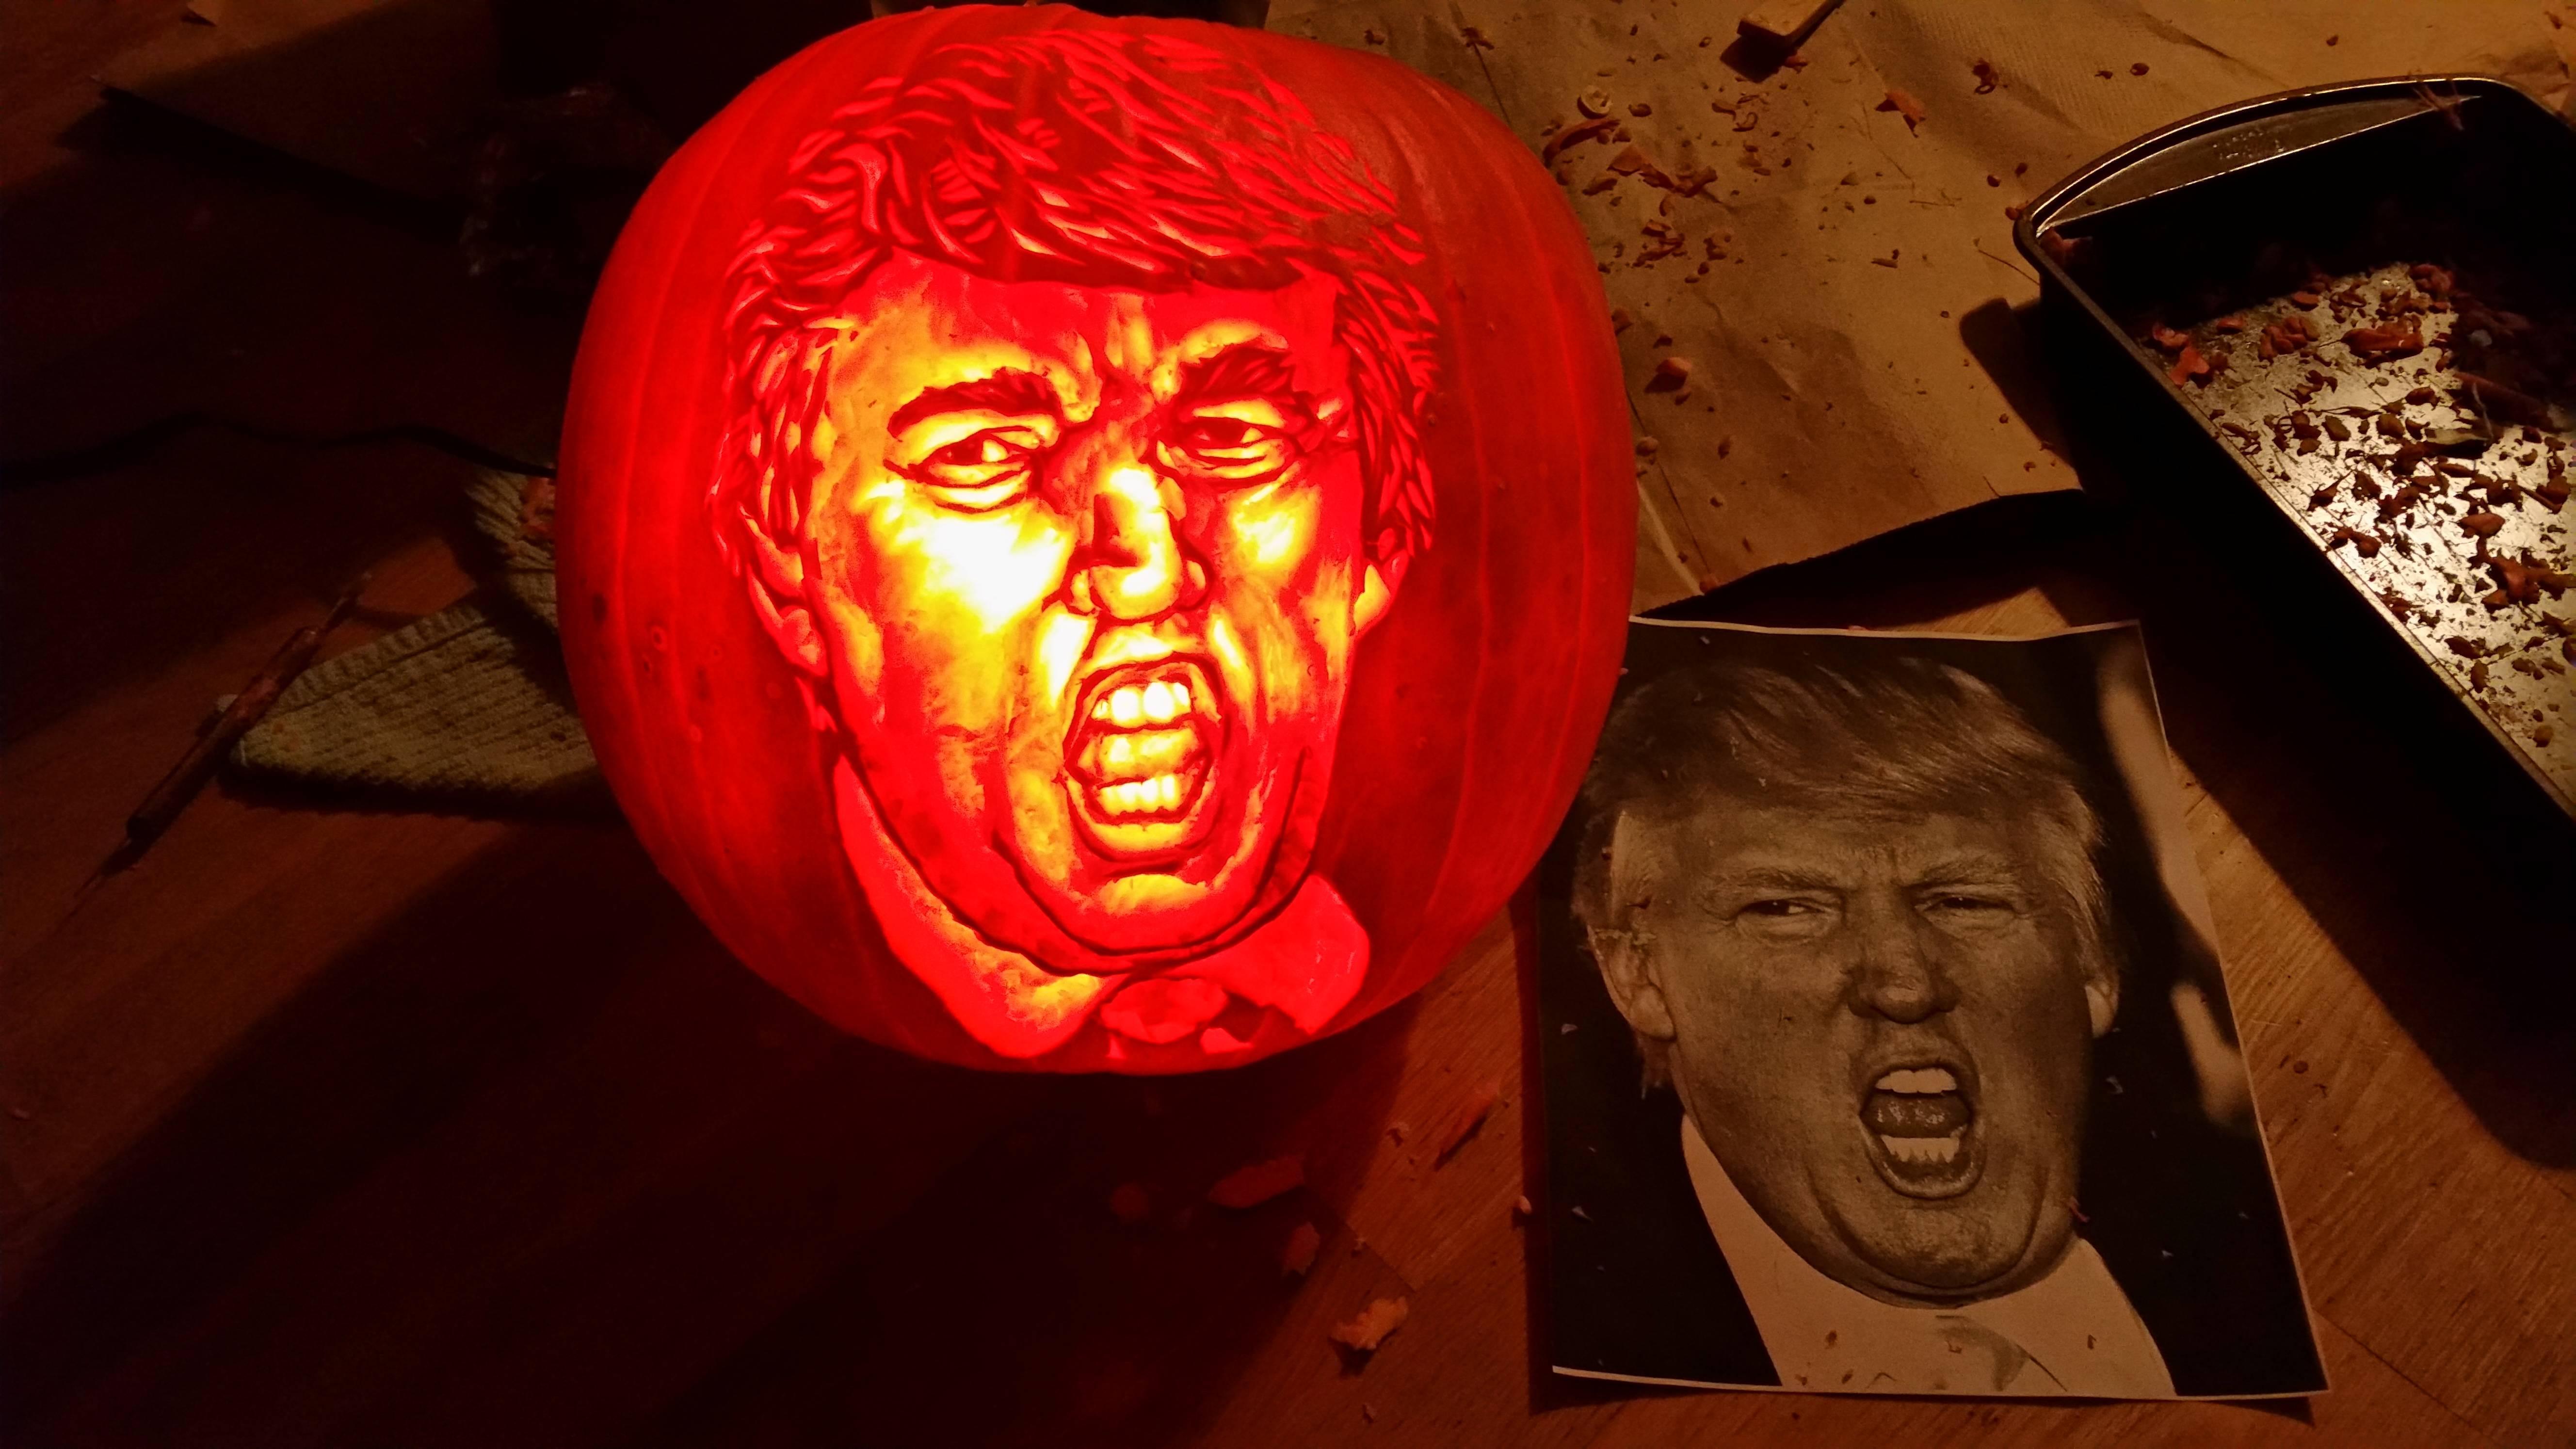 Donald trump pumpkin carving art know your meme